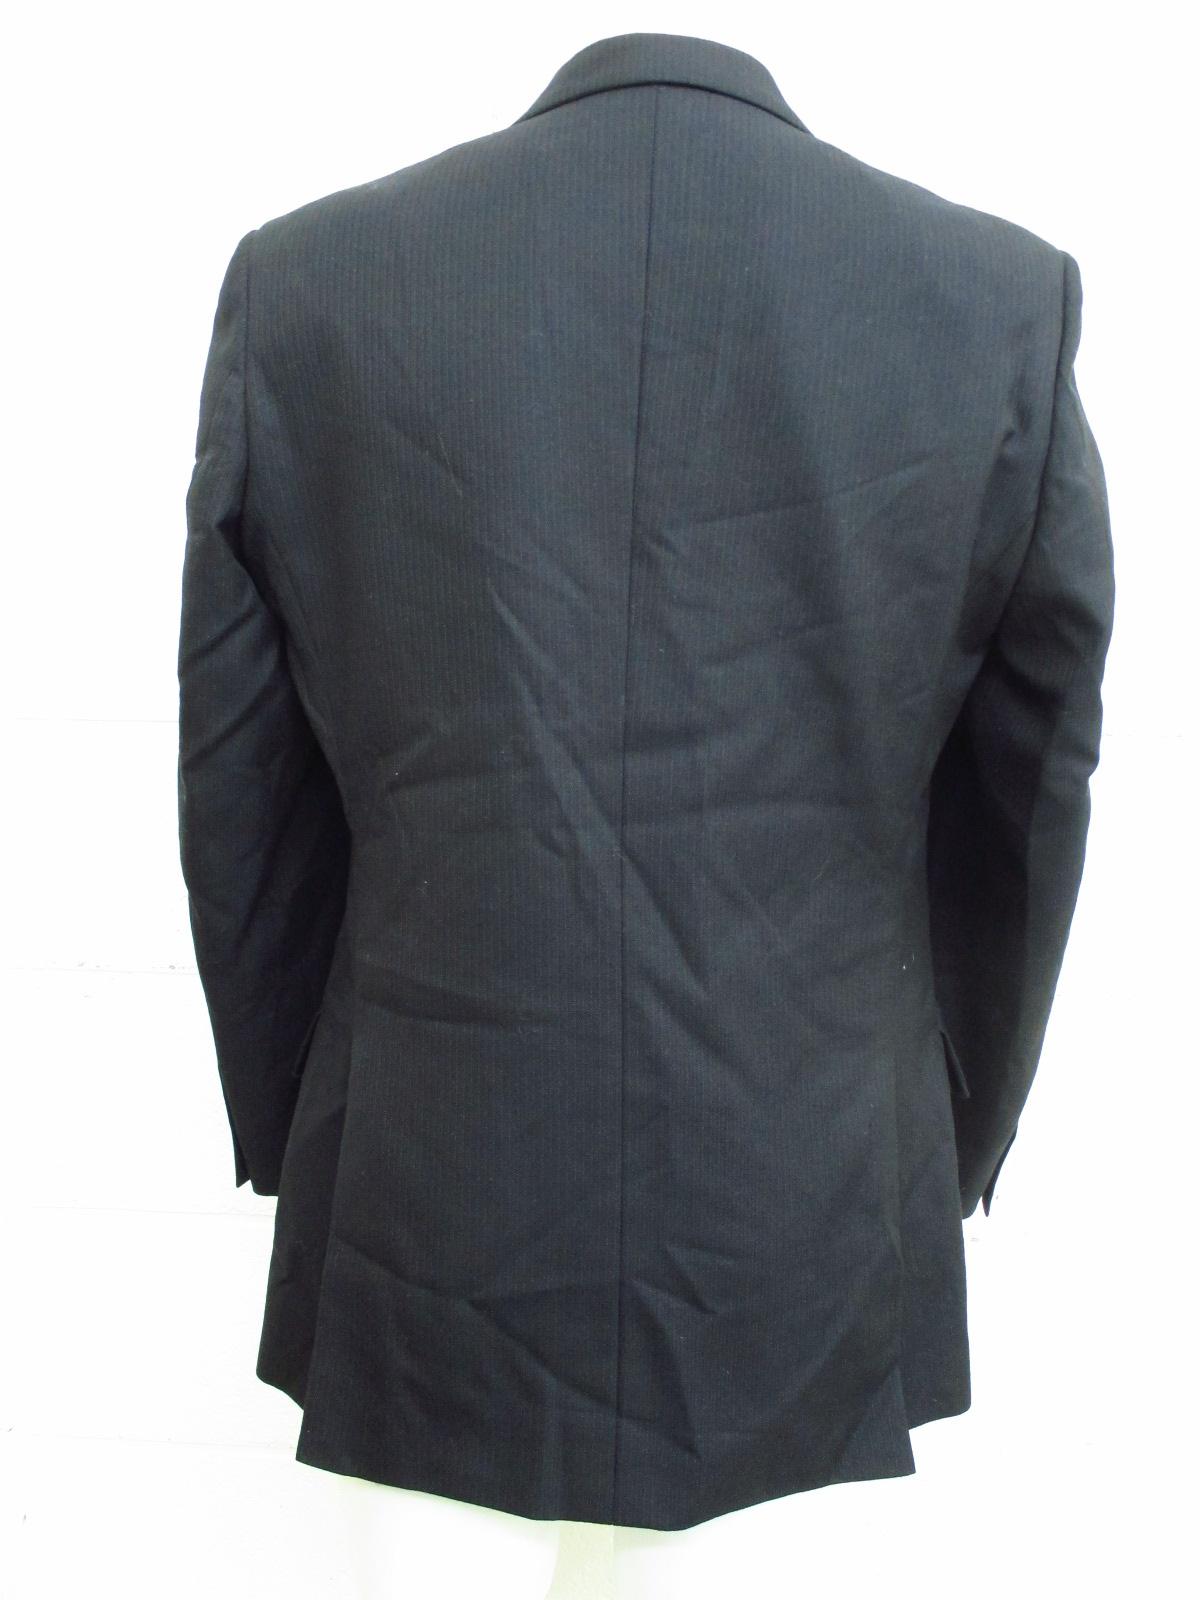 Rock parker(ロックパーカー)のジャケット